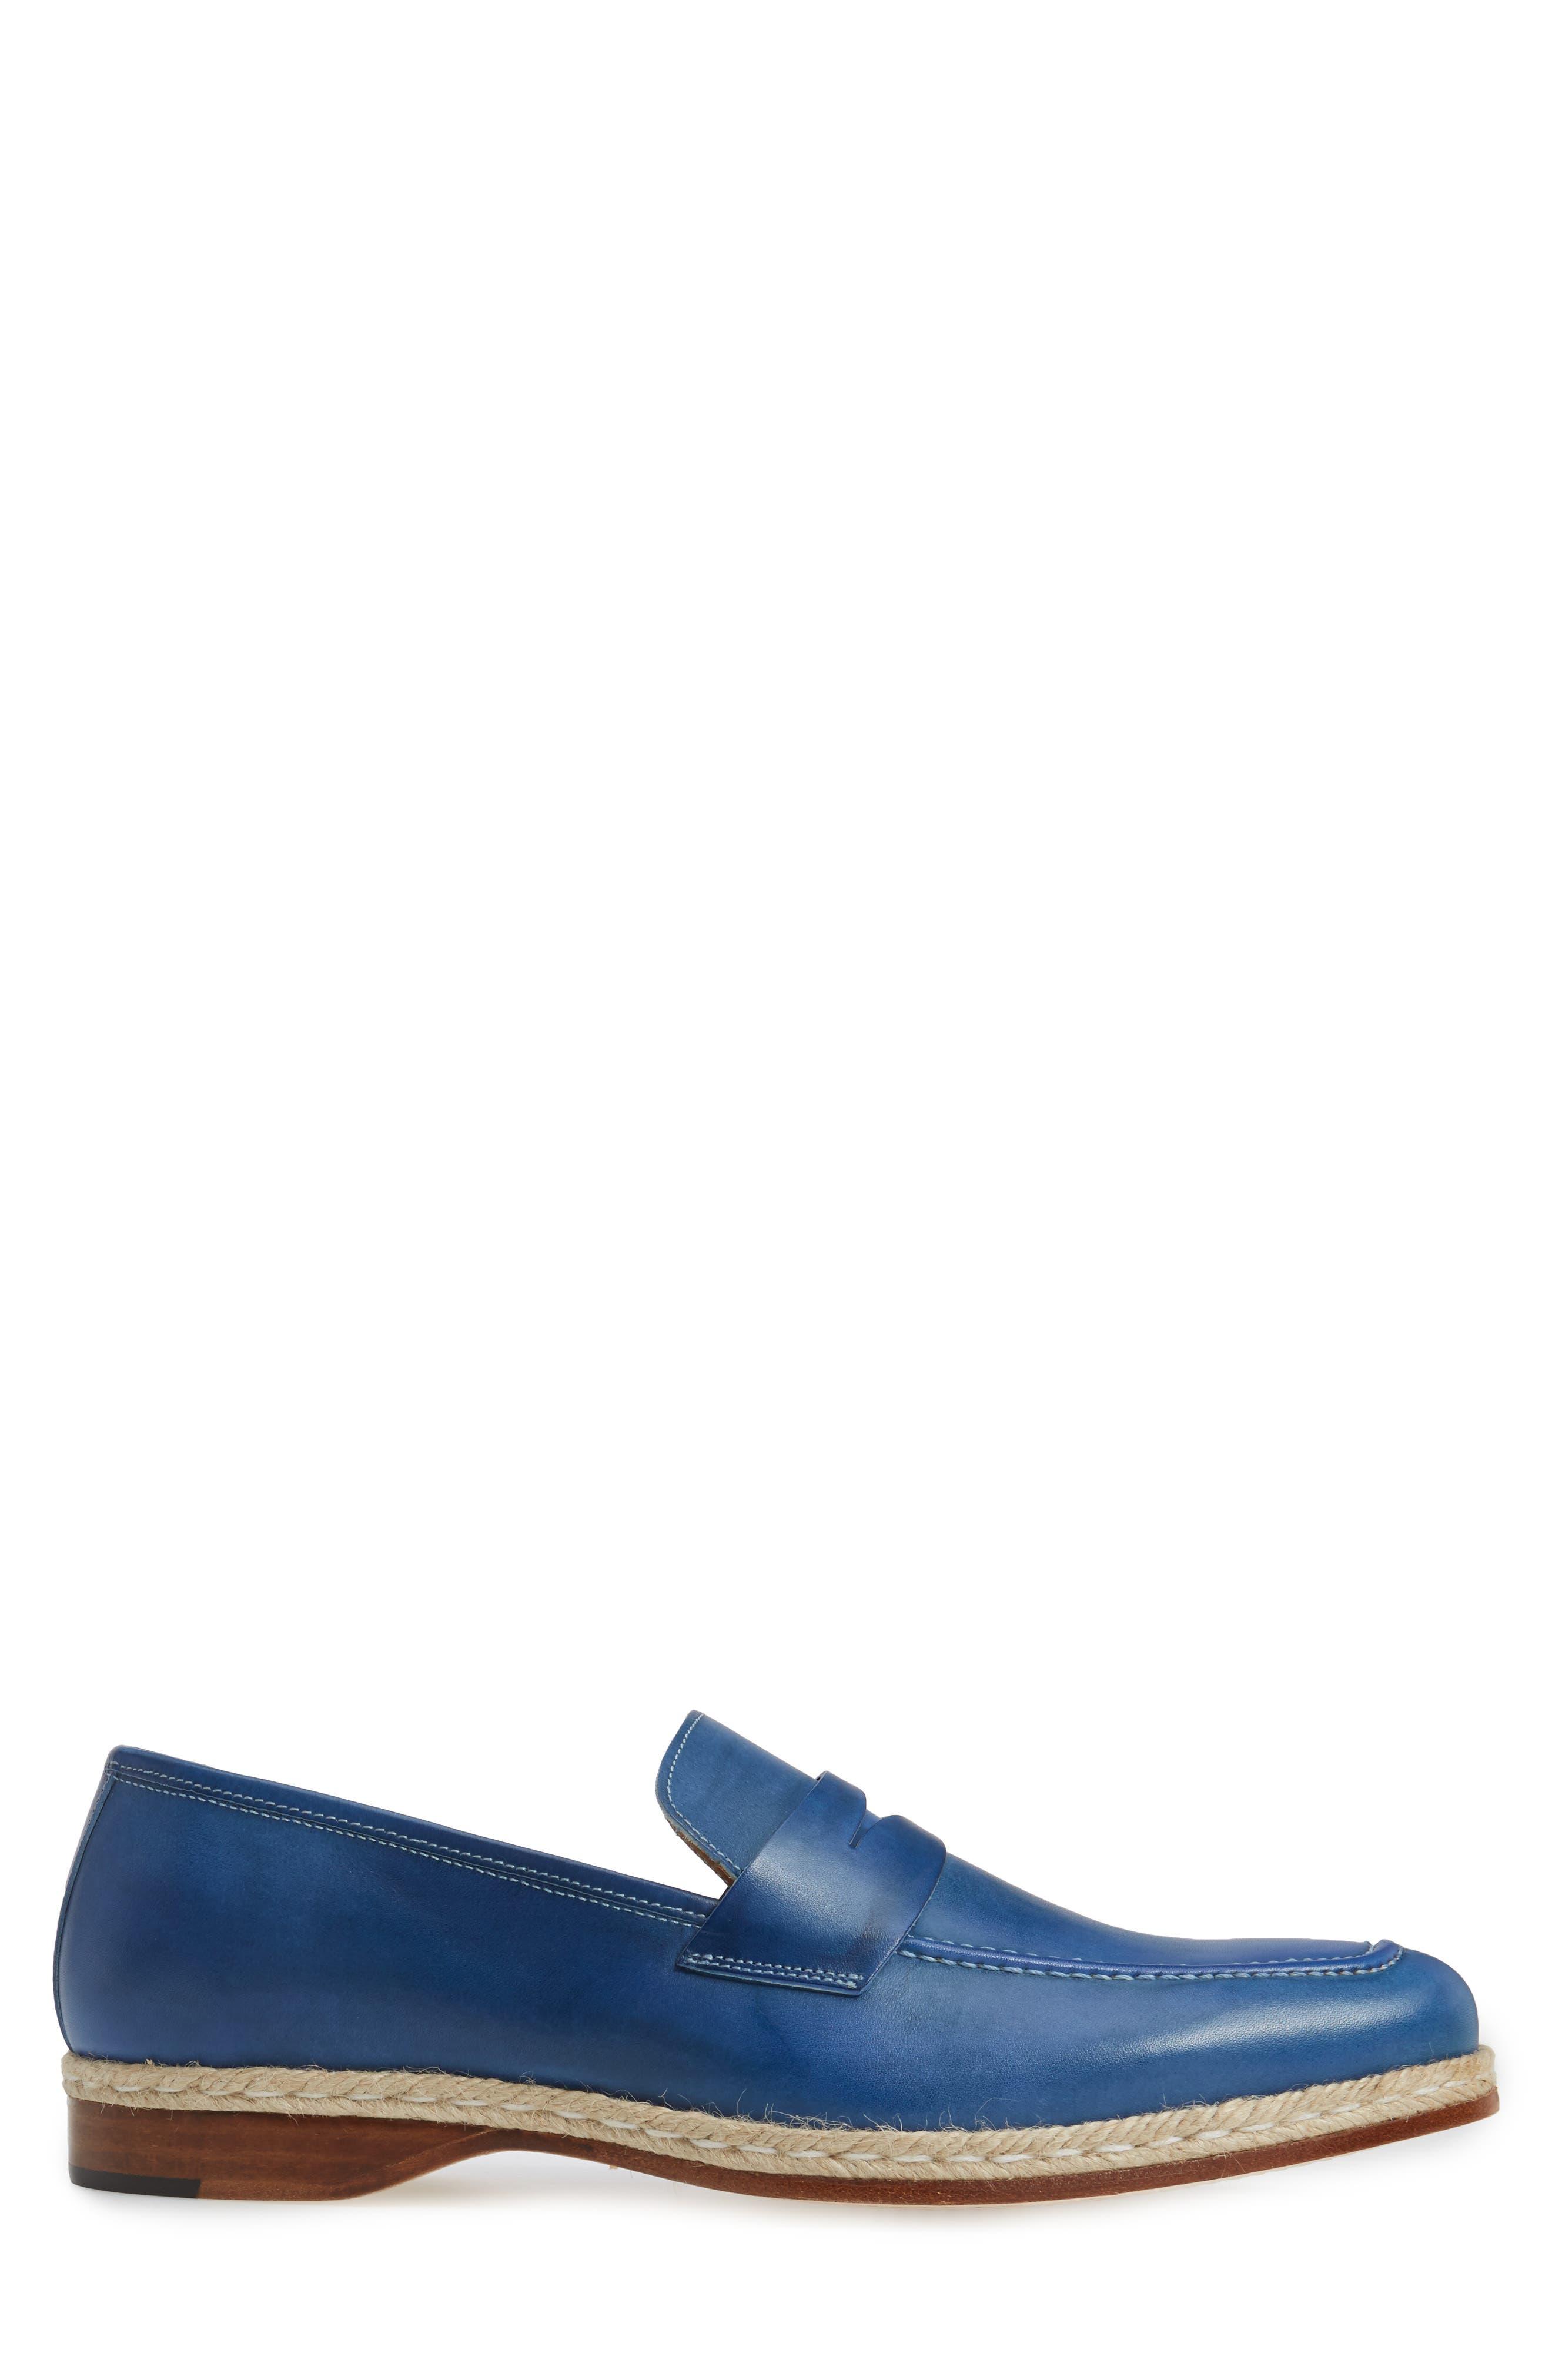 Battani Penny Loafer,                             Alternate thumbnail 3, color,                             Blue Leather